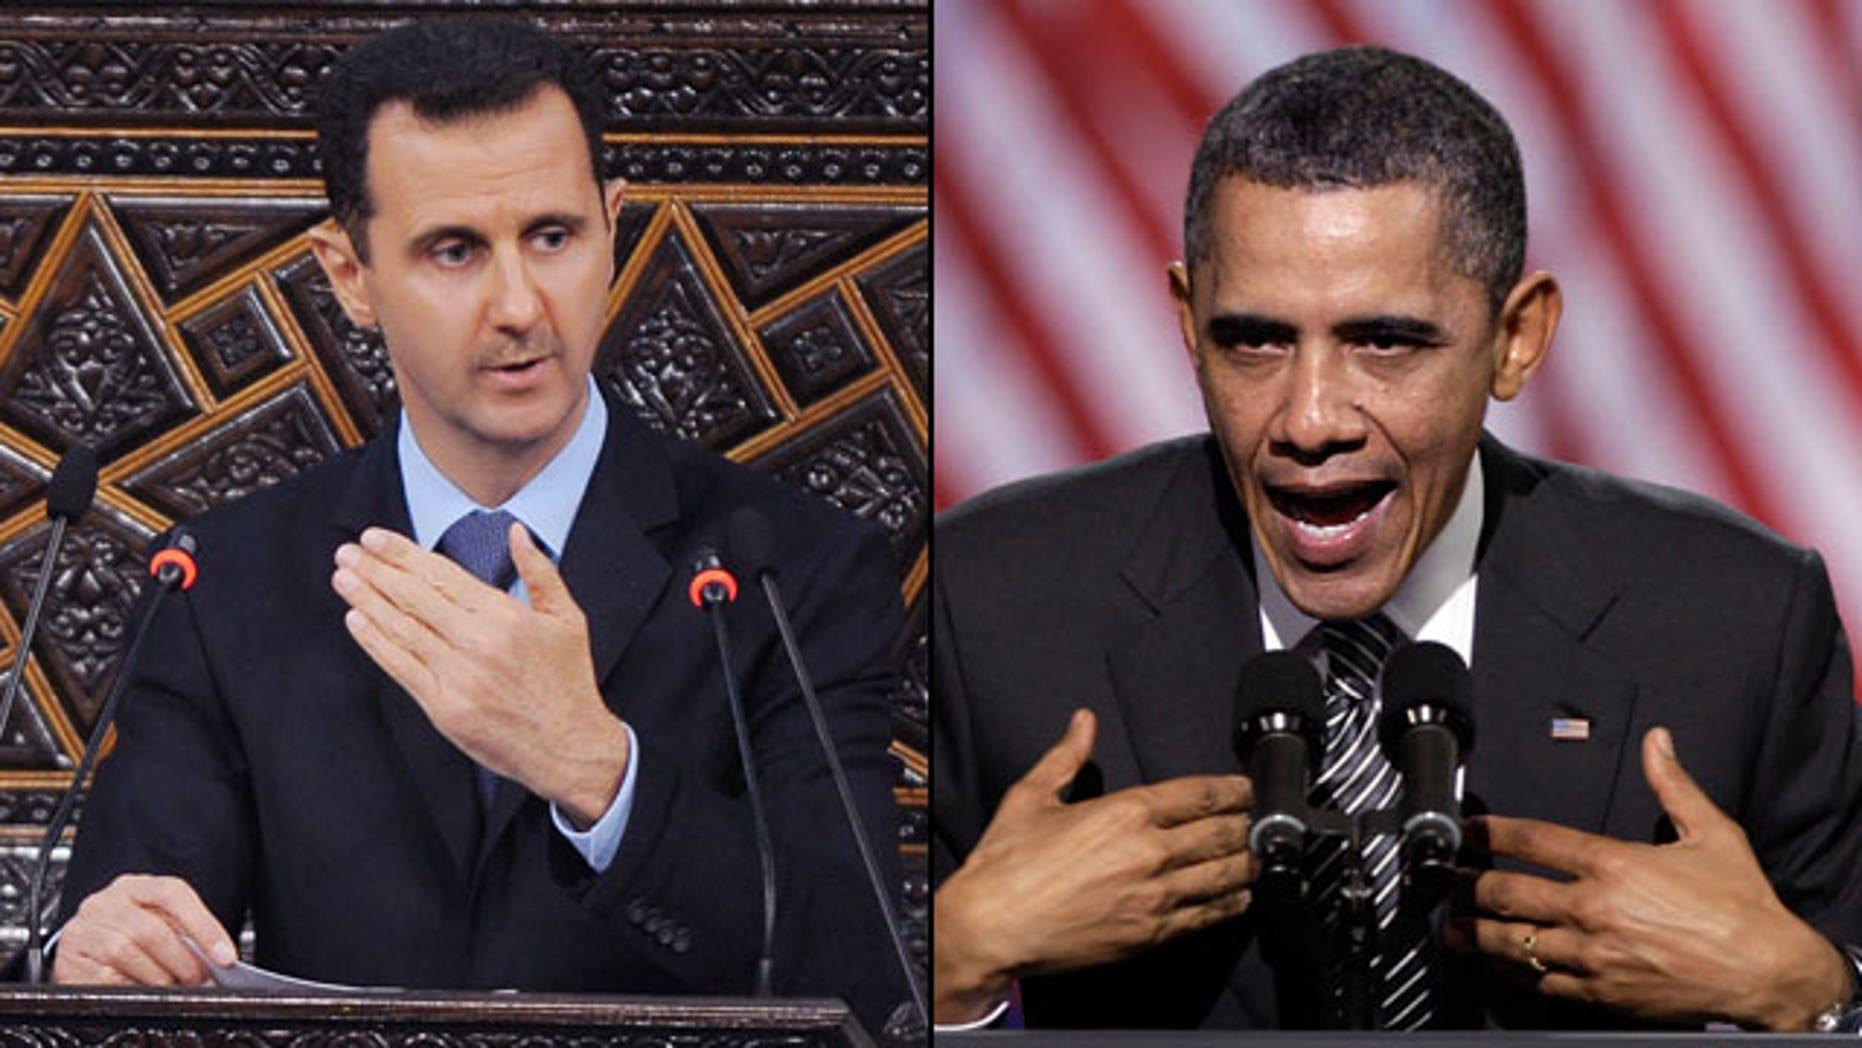 Syrian President Bashar Assad is pushing back against President Obama's condemnation of his violent crackdown on protesters. (AP)